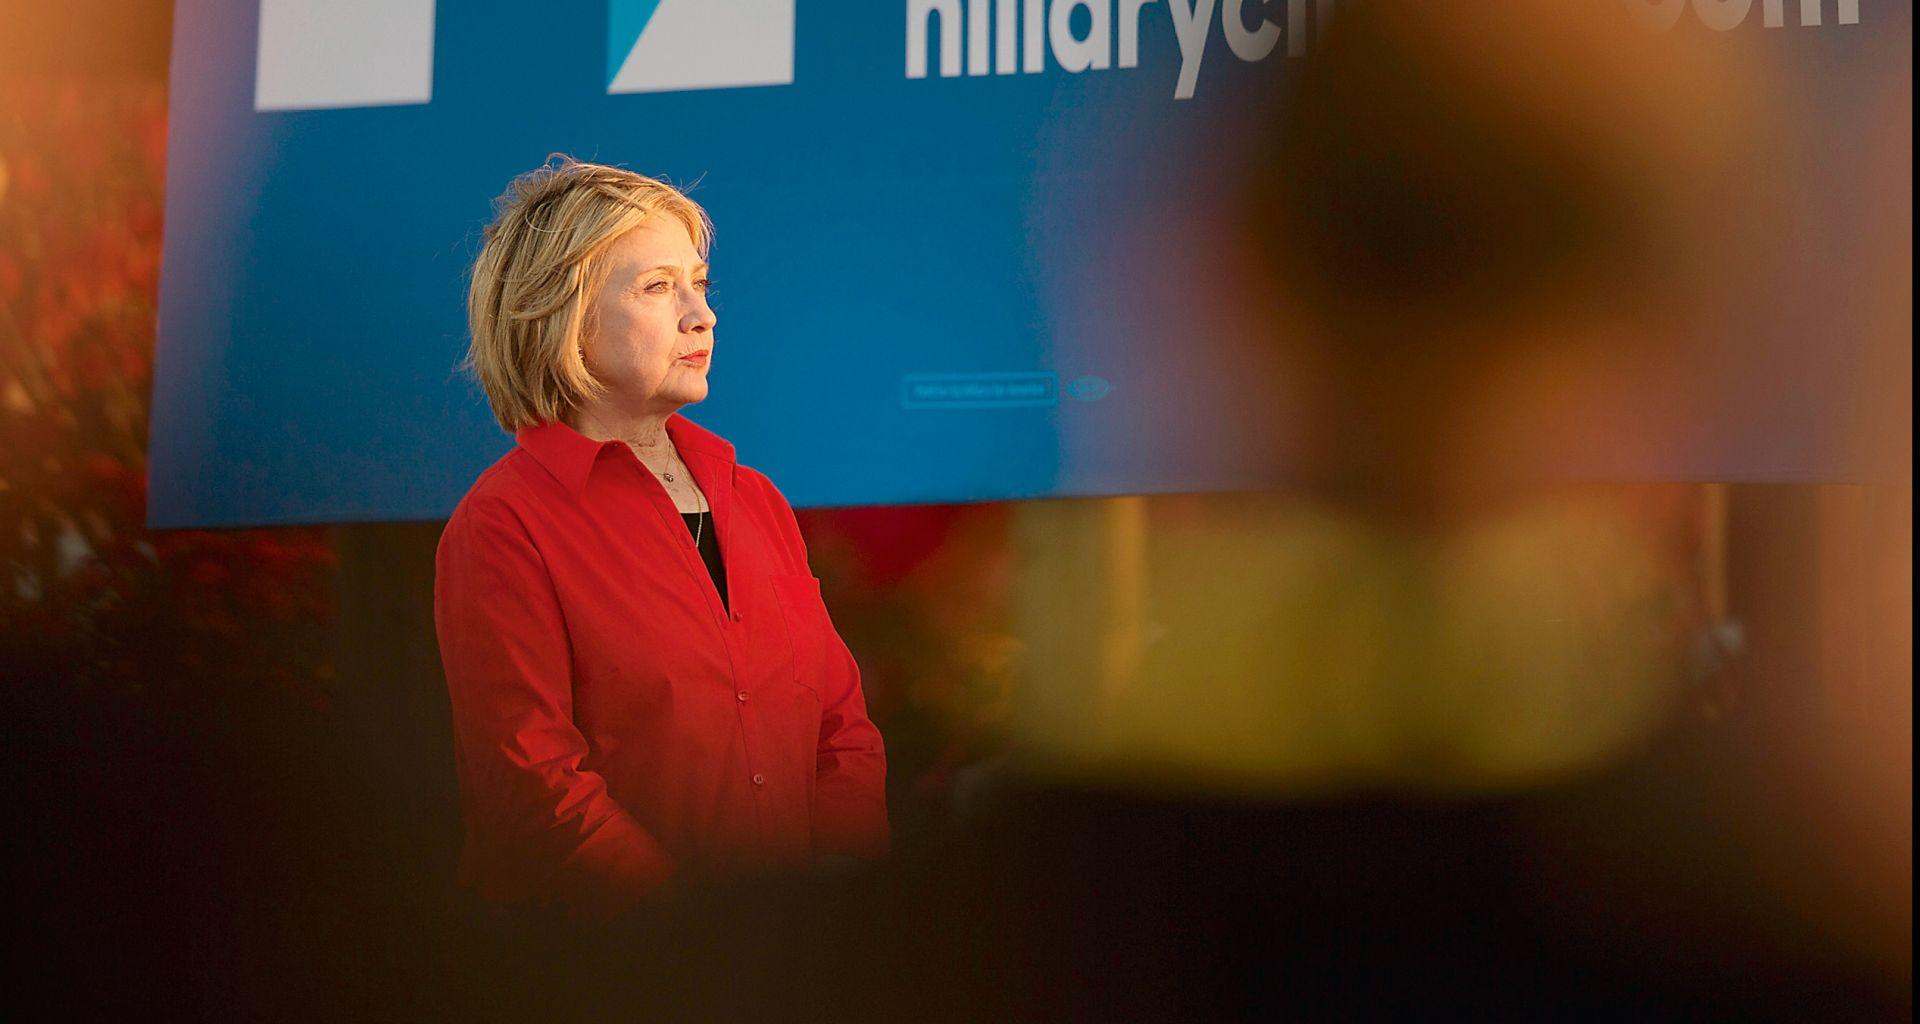 Burna prošlost Billa Clintona izgleda dolazi na naplatu Hillary Clinton